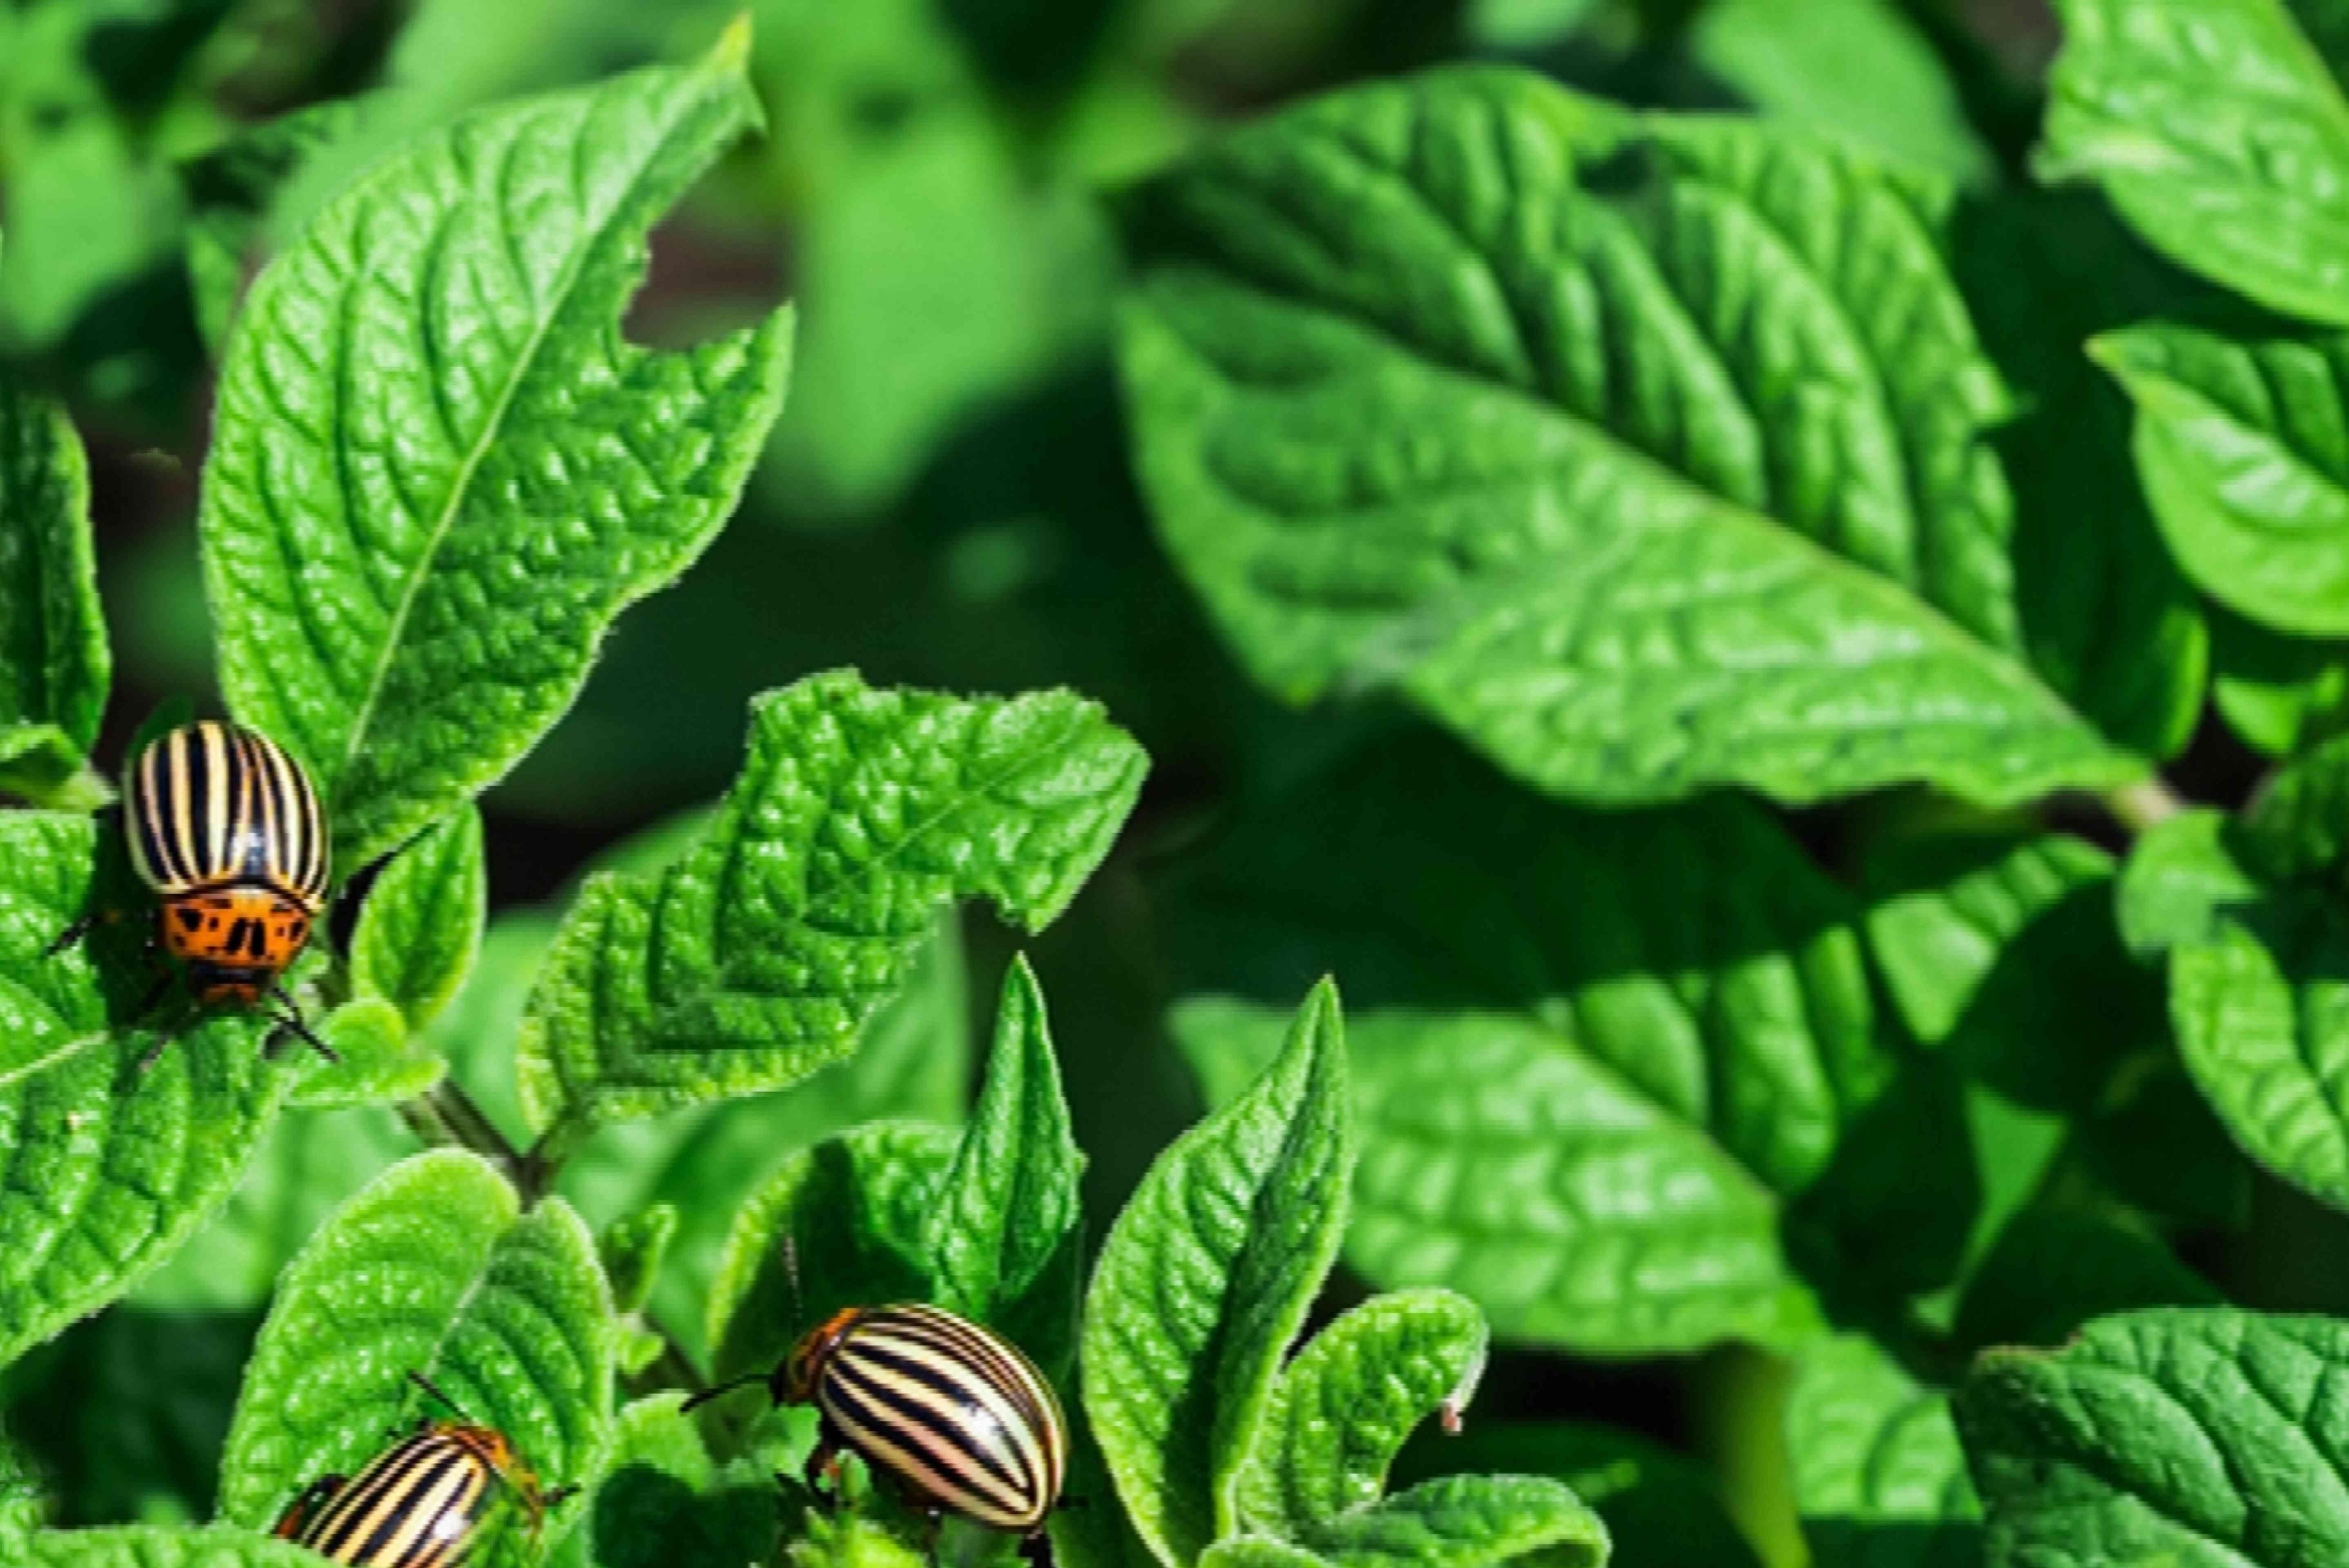 pests on potato plants